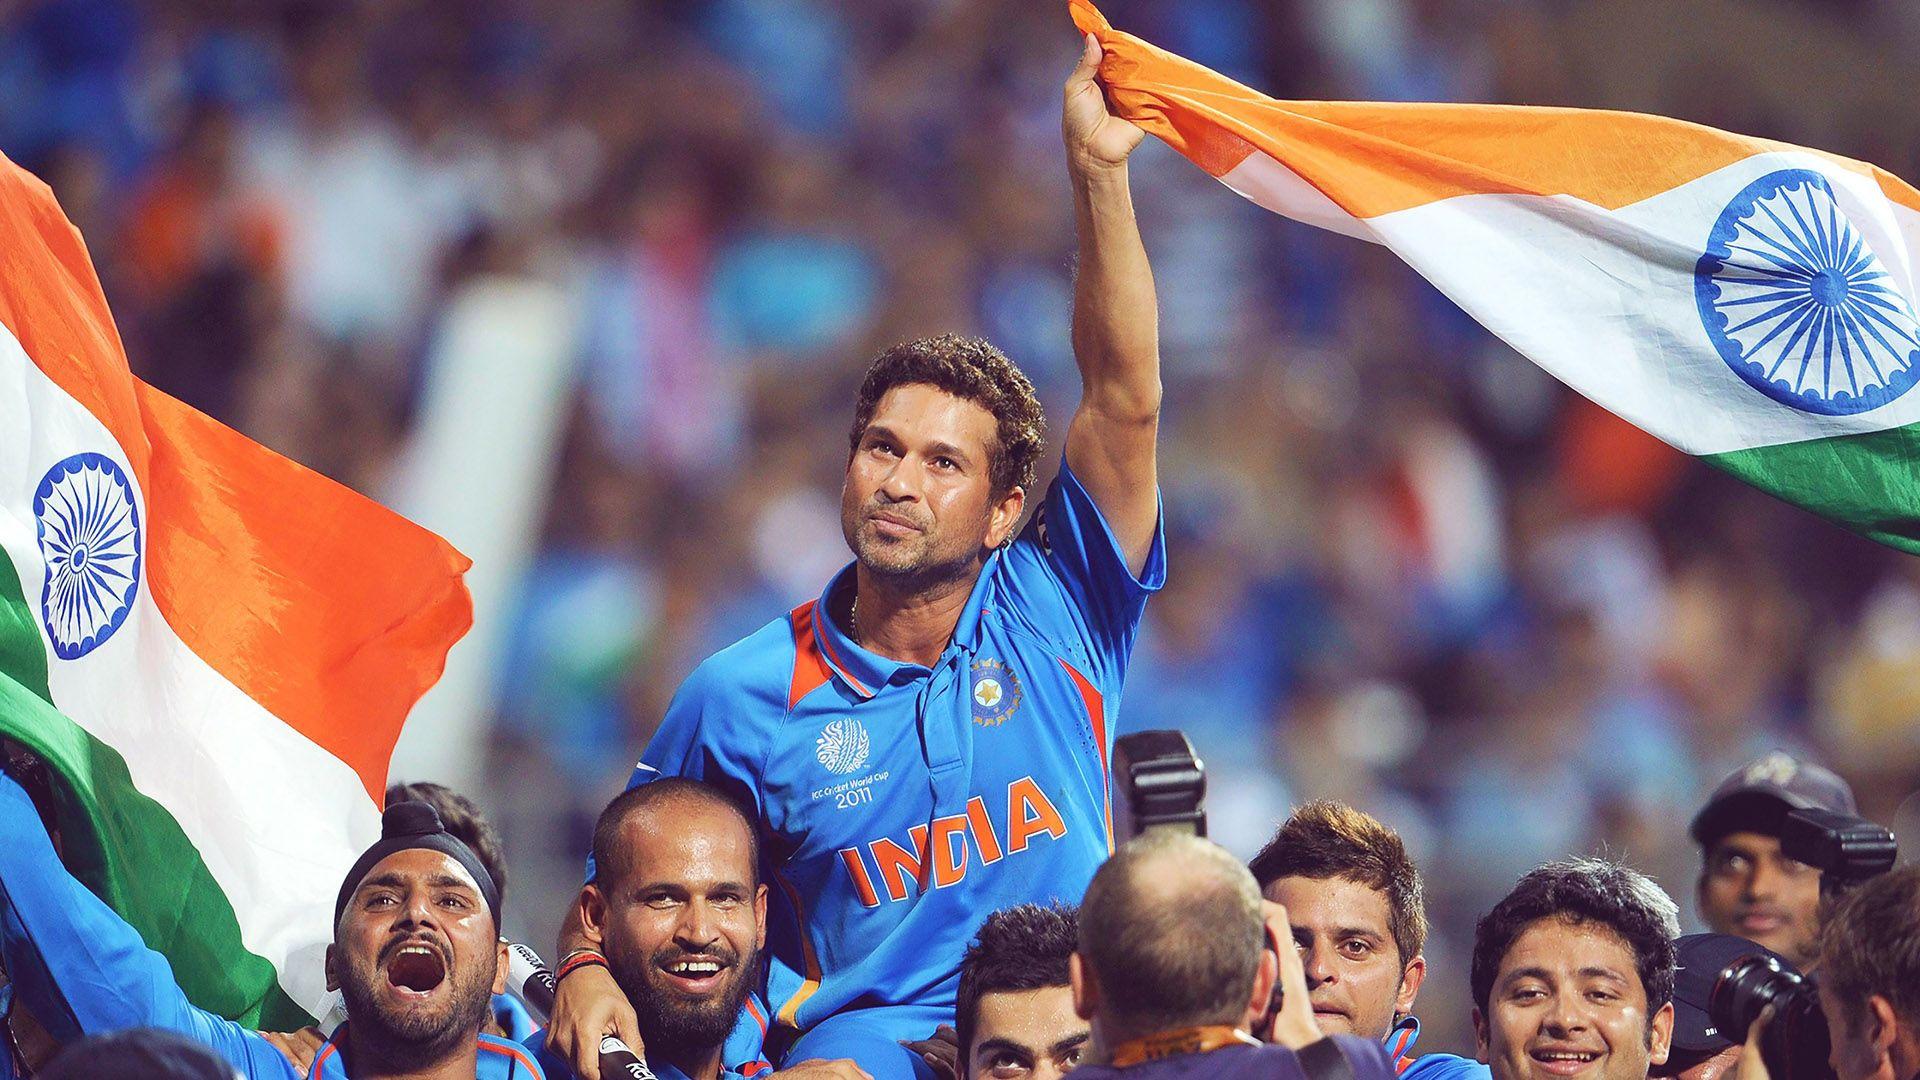 Indian Flag Cricket: Sachin Tendulkar Celebrating 2011 Cricket World Cup India